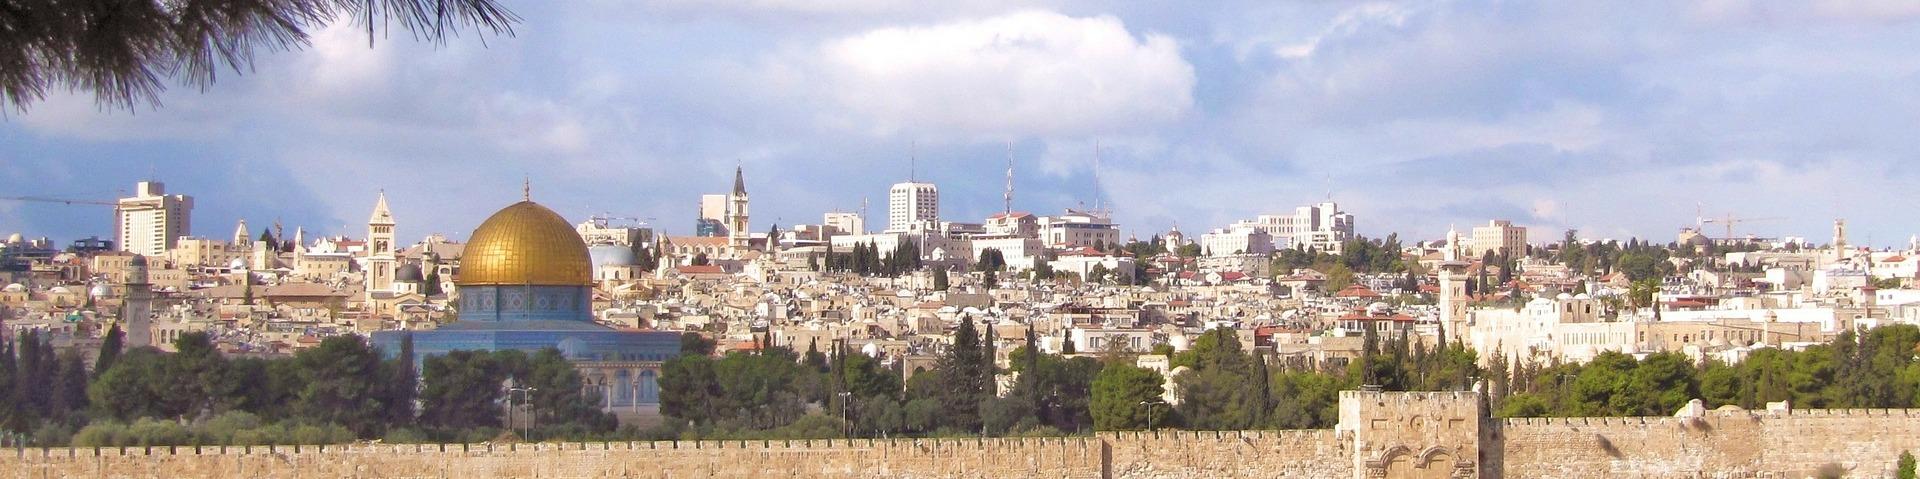 jerusalem-342813_1920